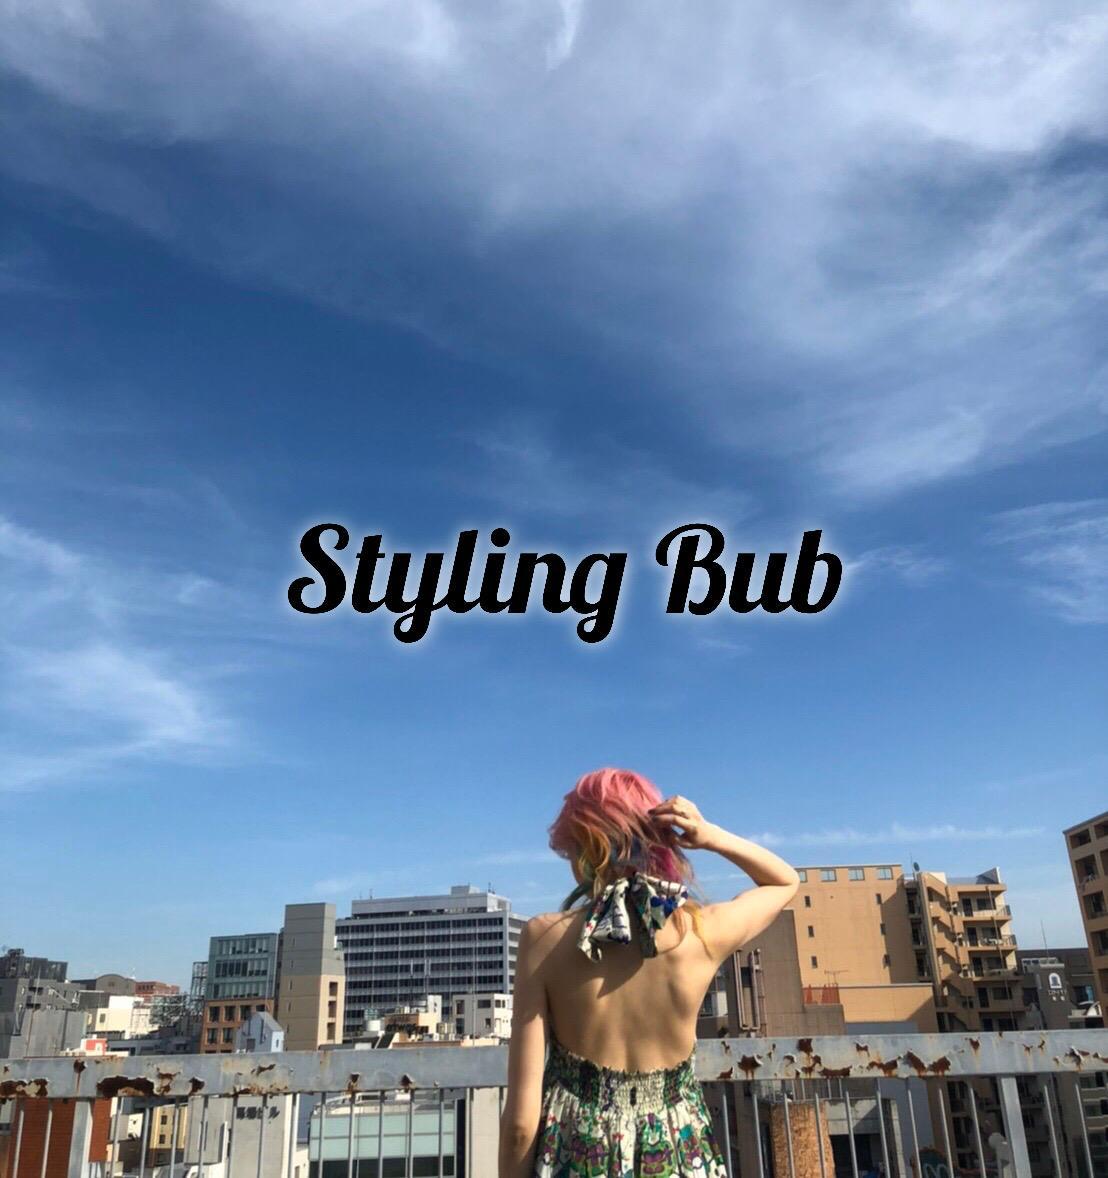 Styling Bub スタッフ募集